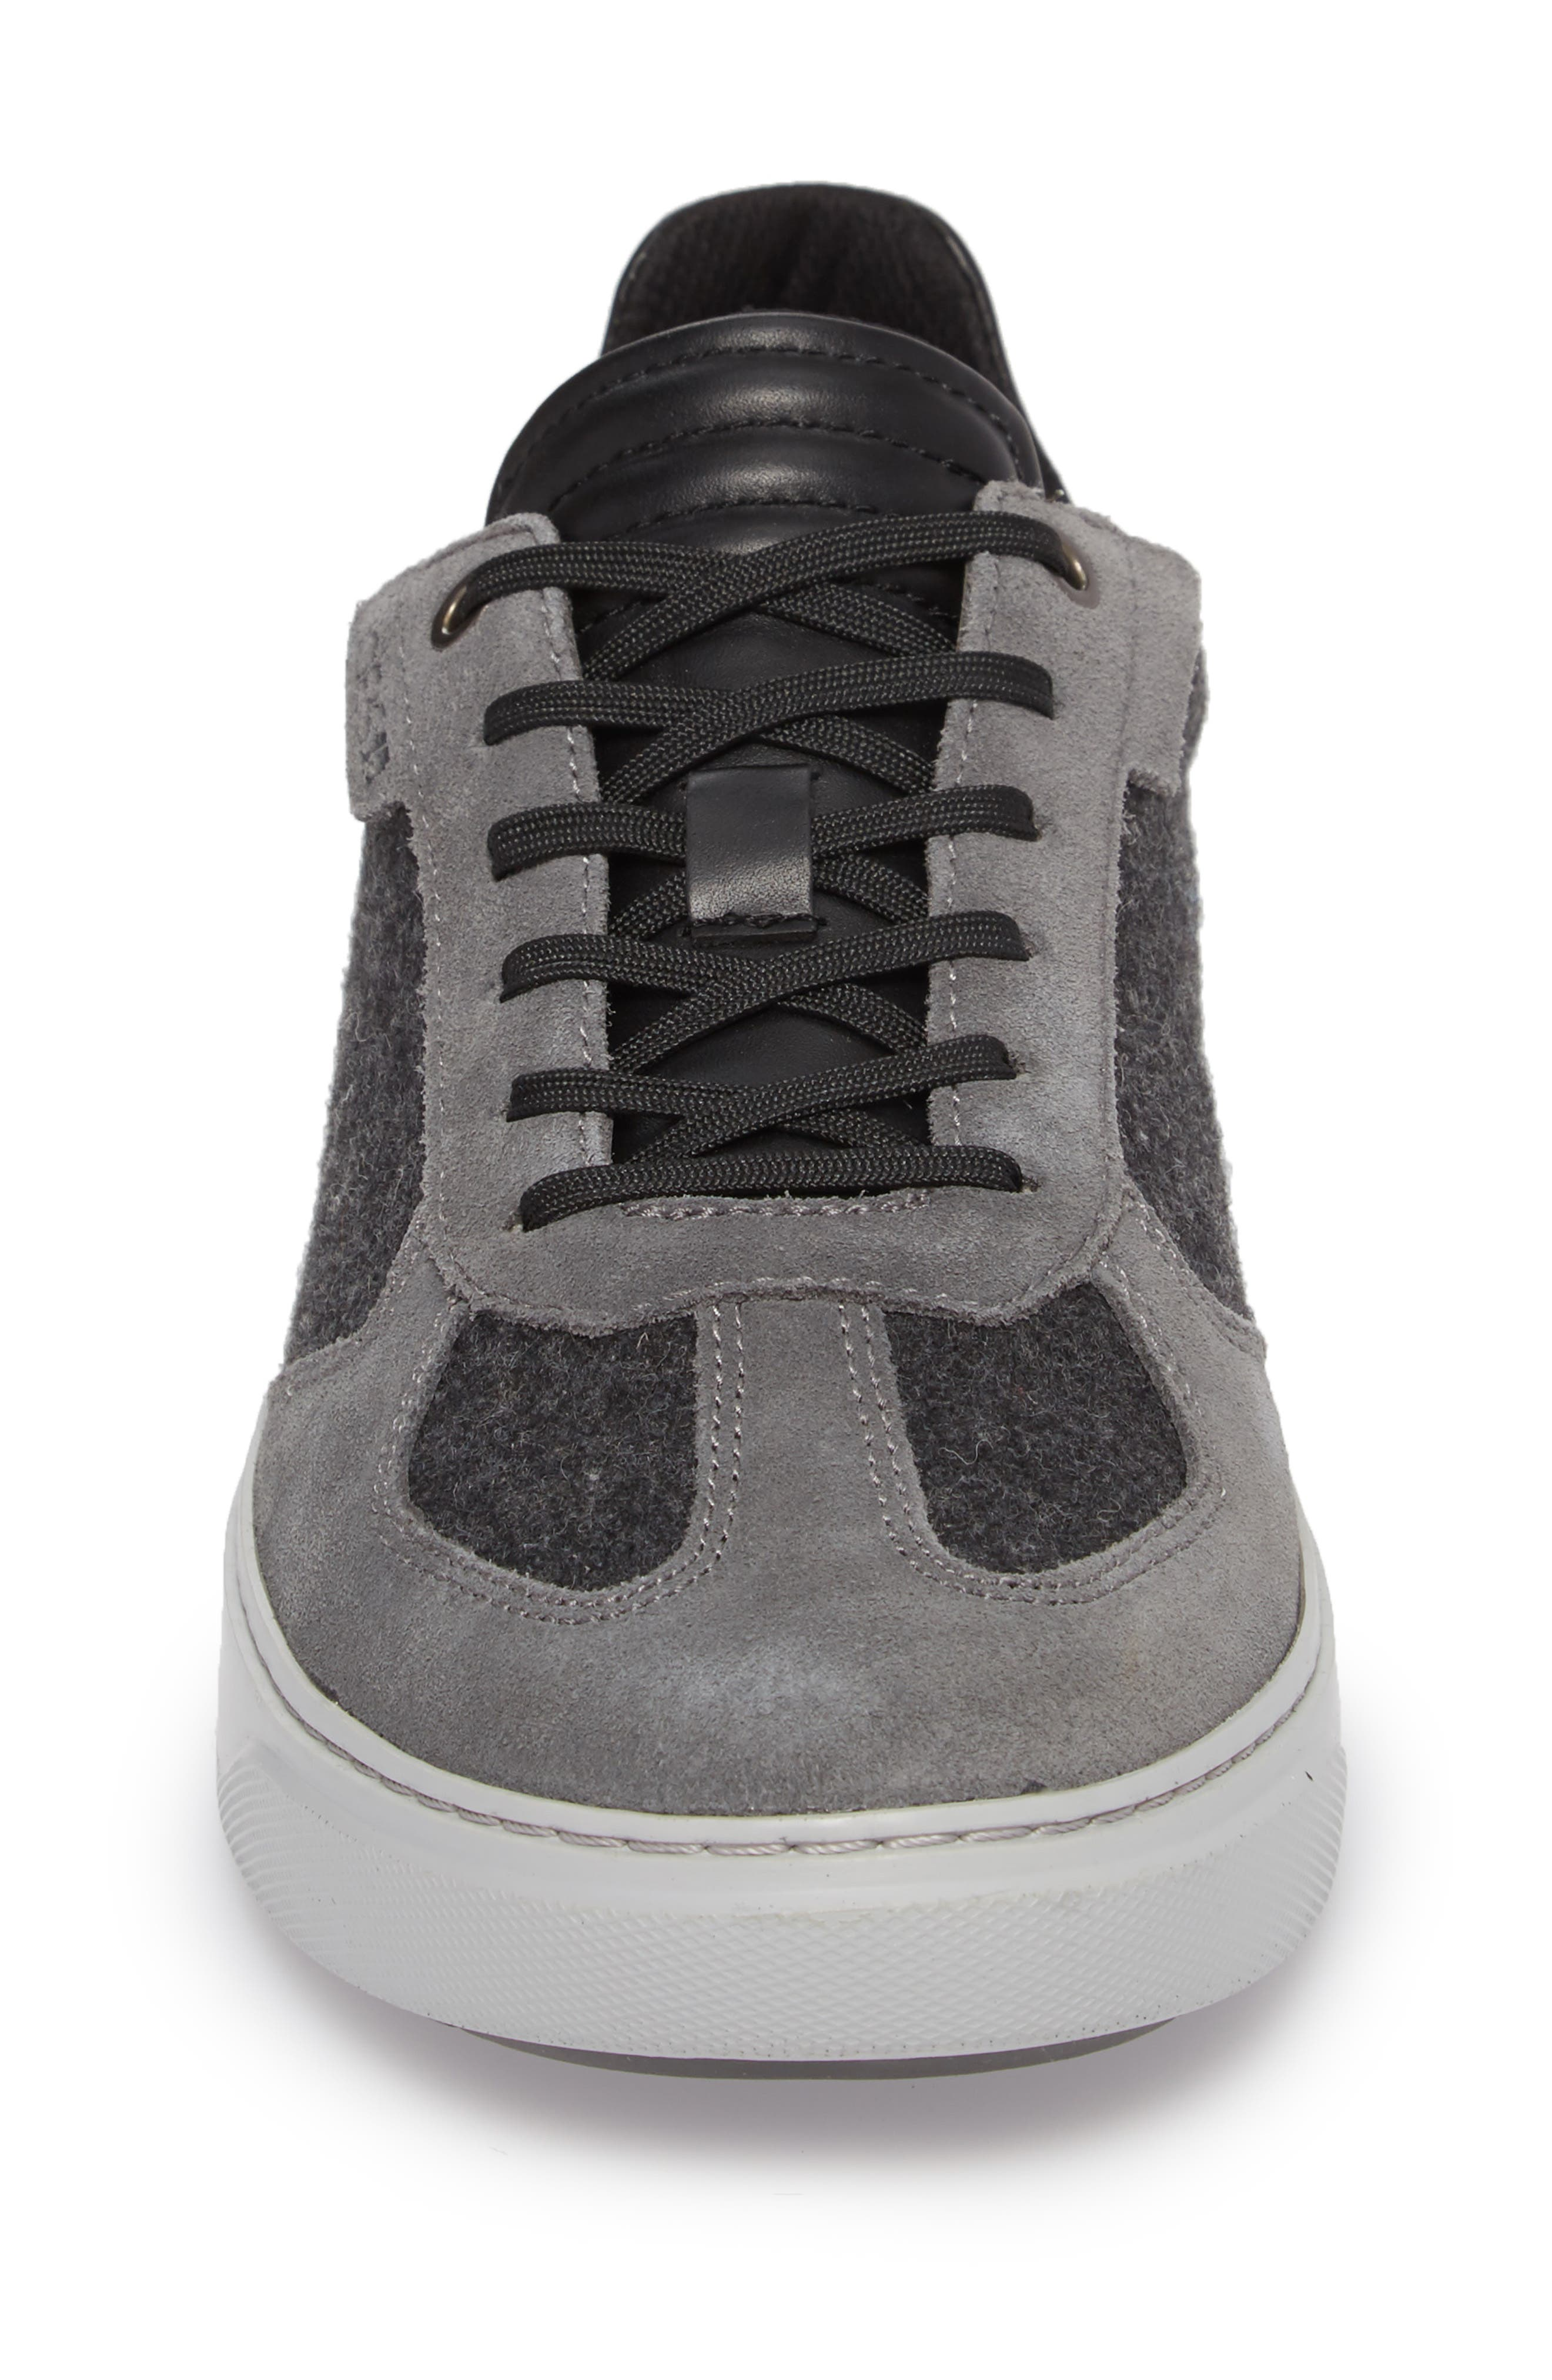 Mo Joe Sneaker,                             Alternate thumbnail 4, color,                             Charcoal Wool/ Suede